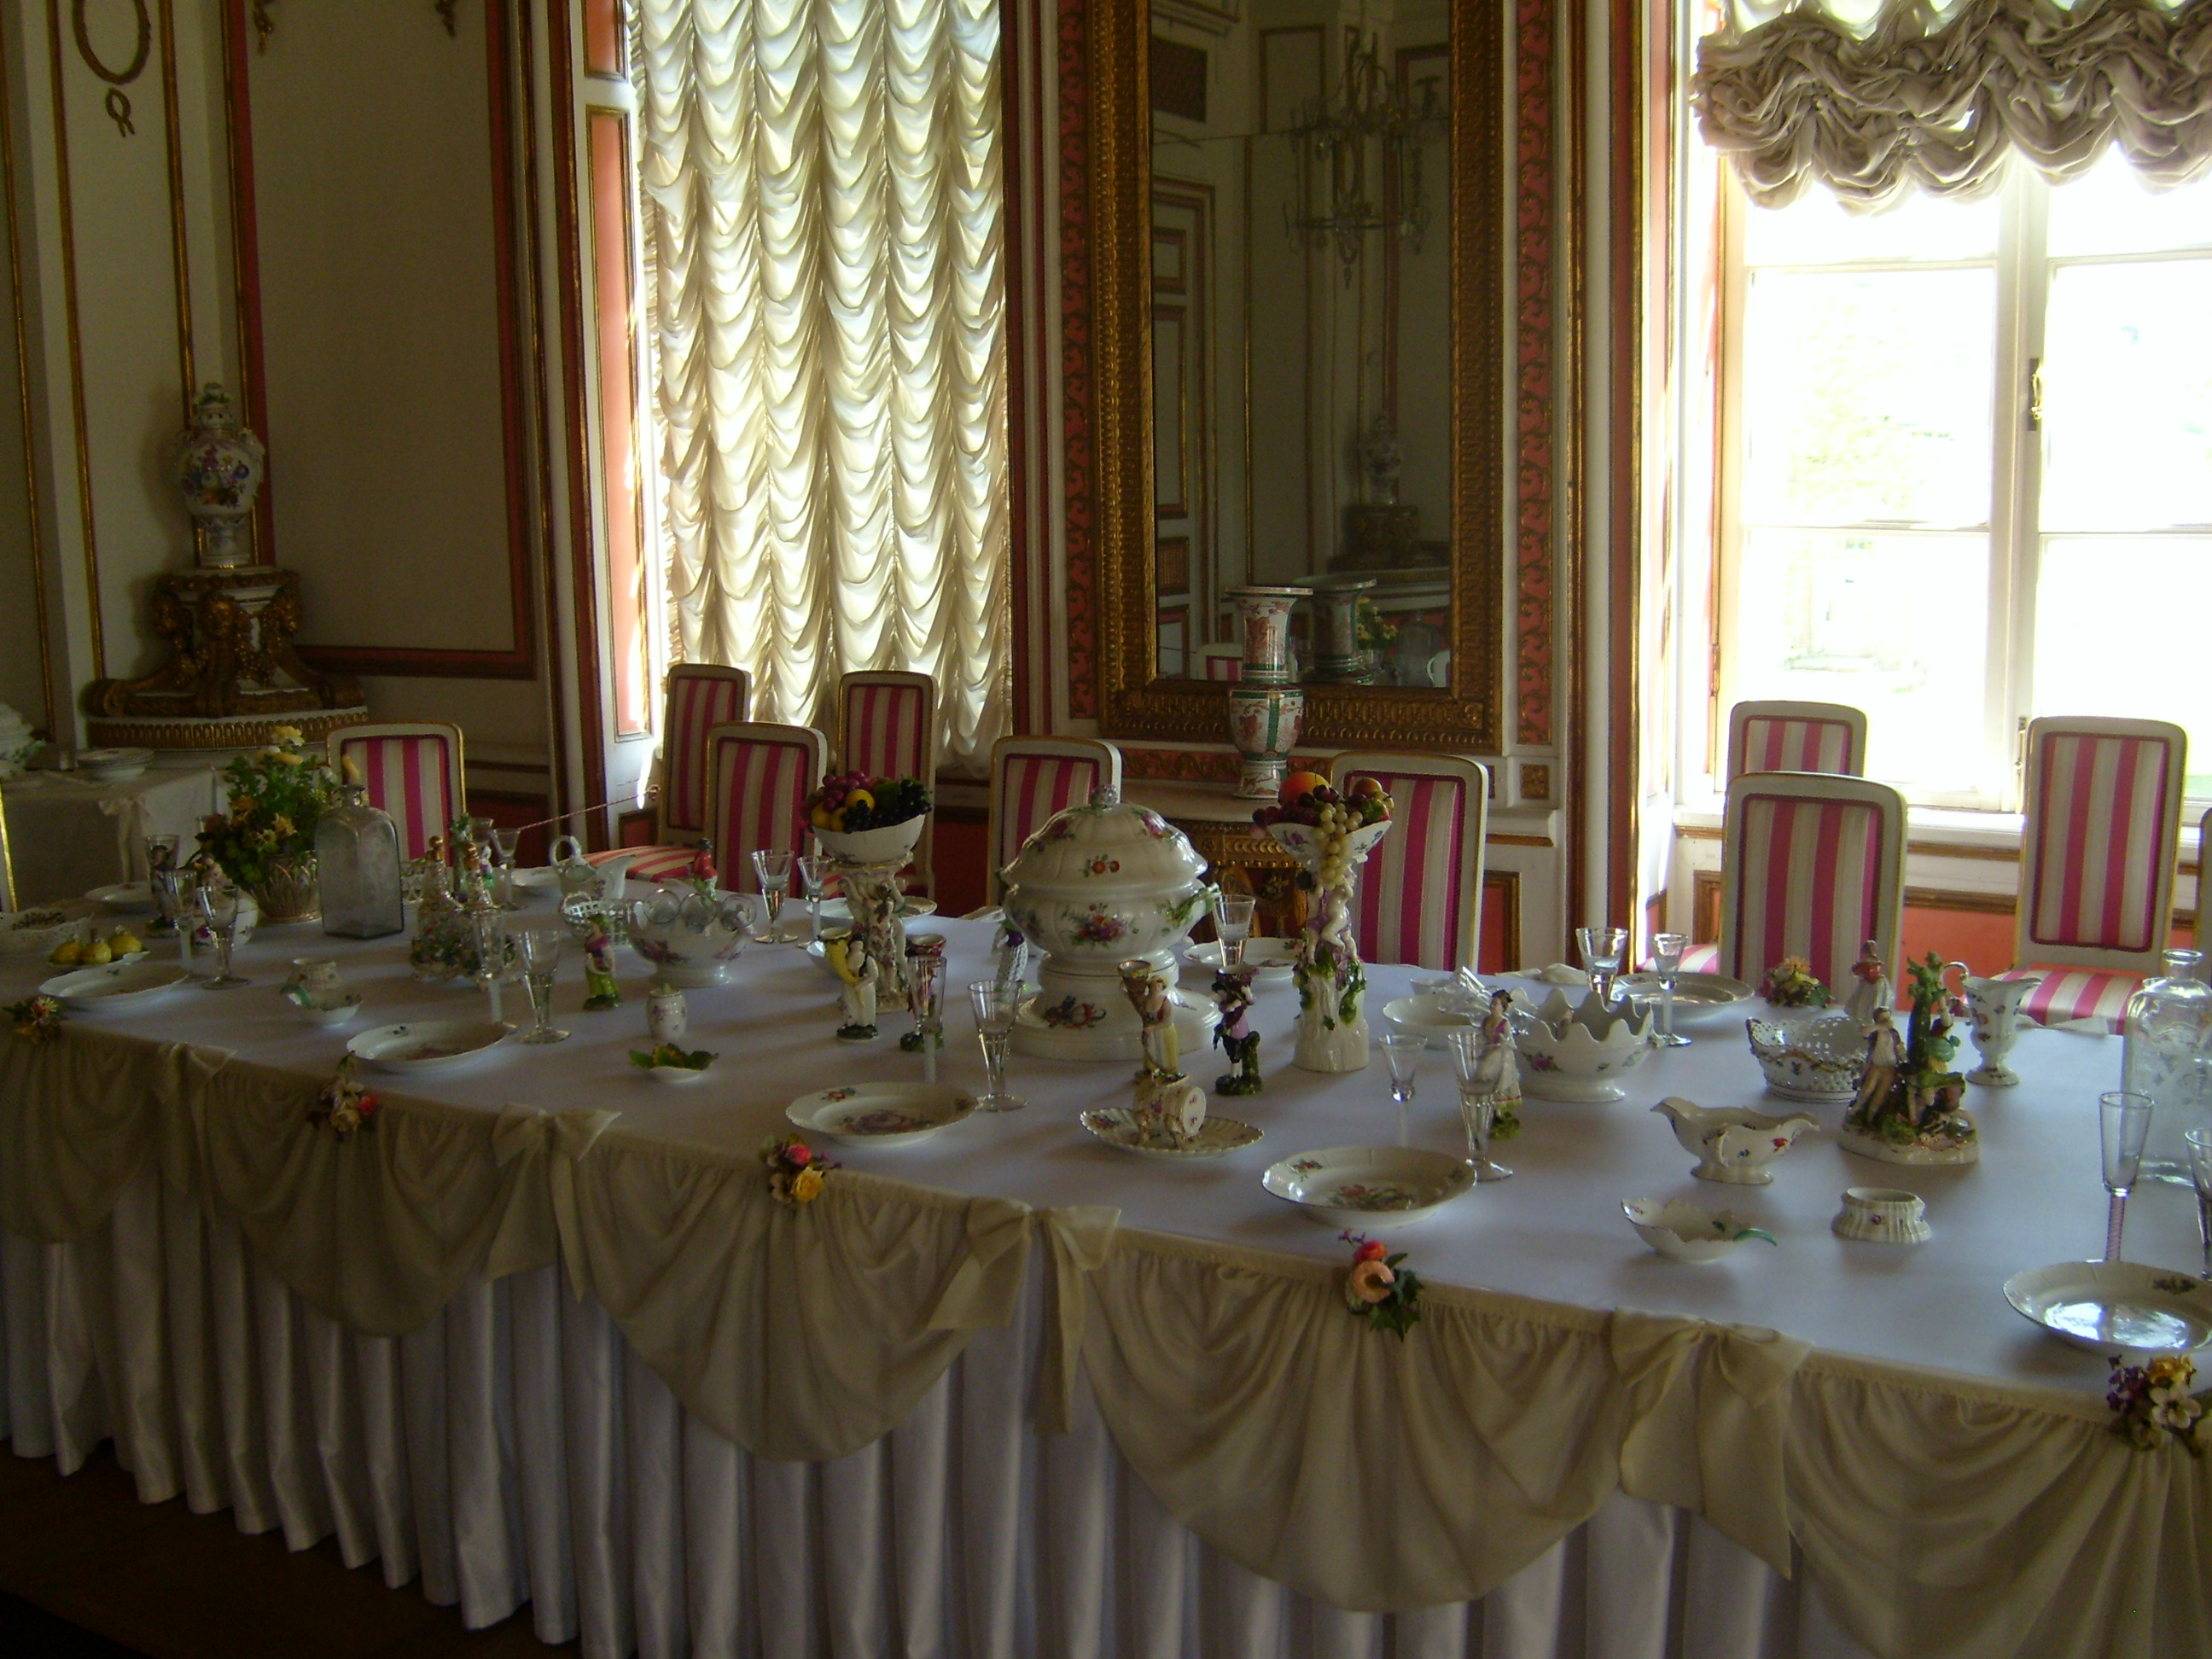 file:kuskovo palace dining room - wikimedia commons